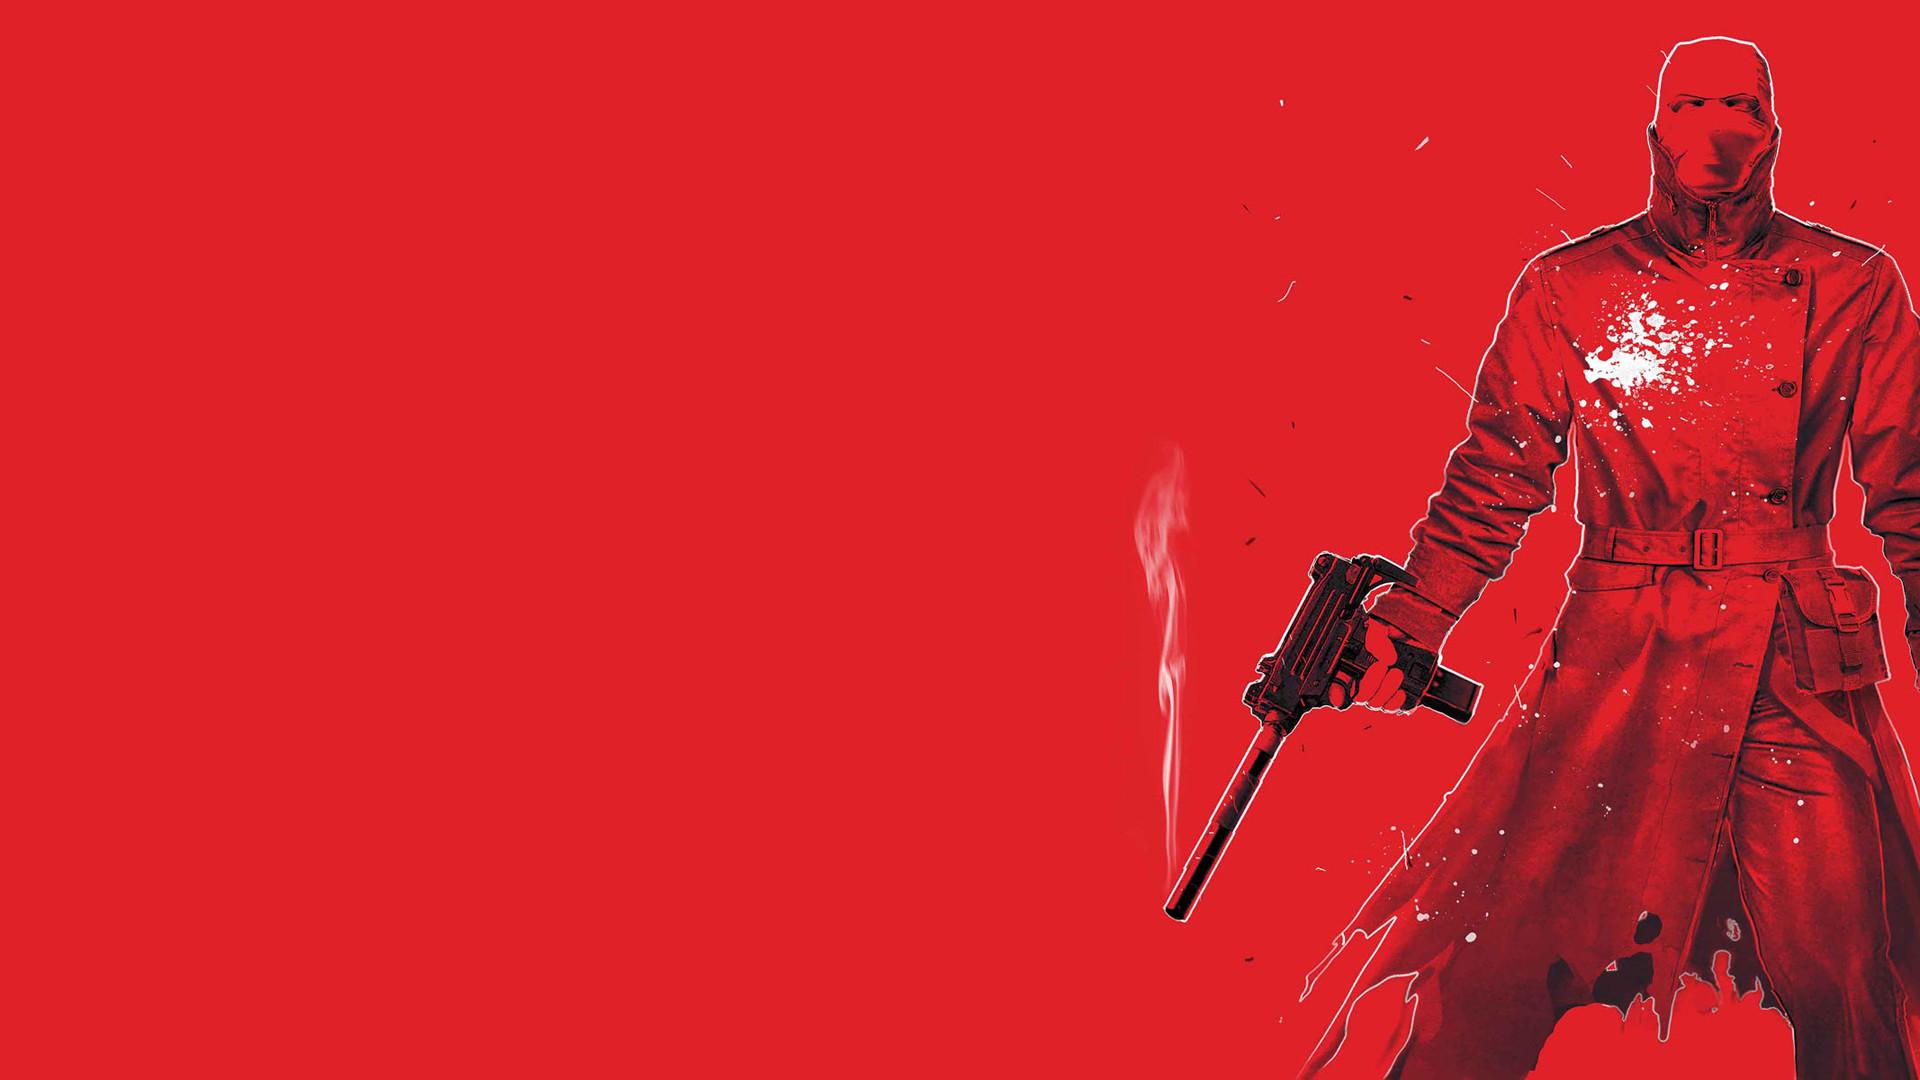 213 Red Hood Wallpaper Hd